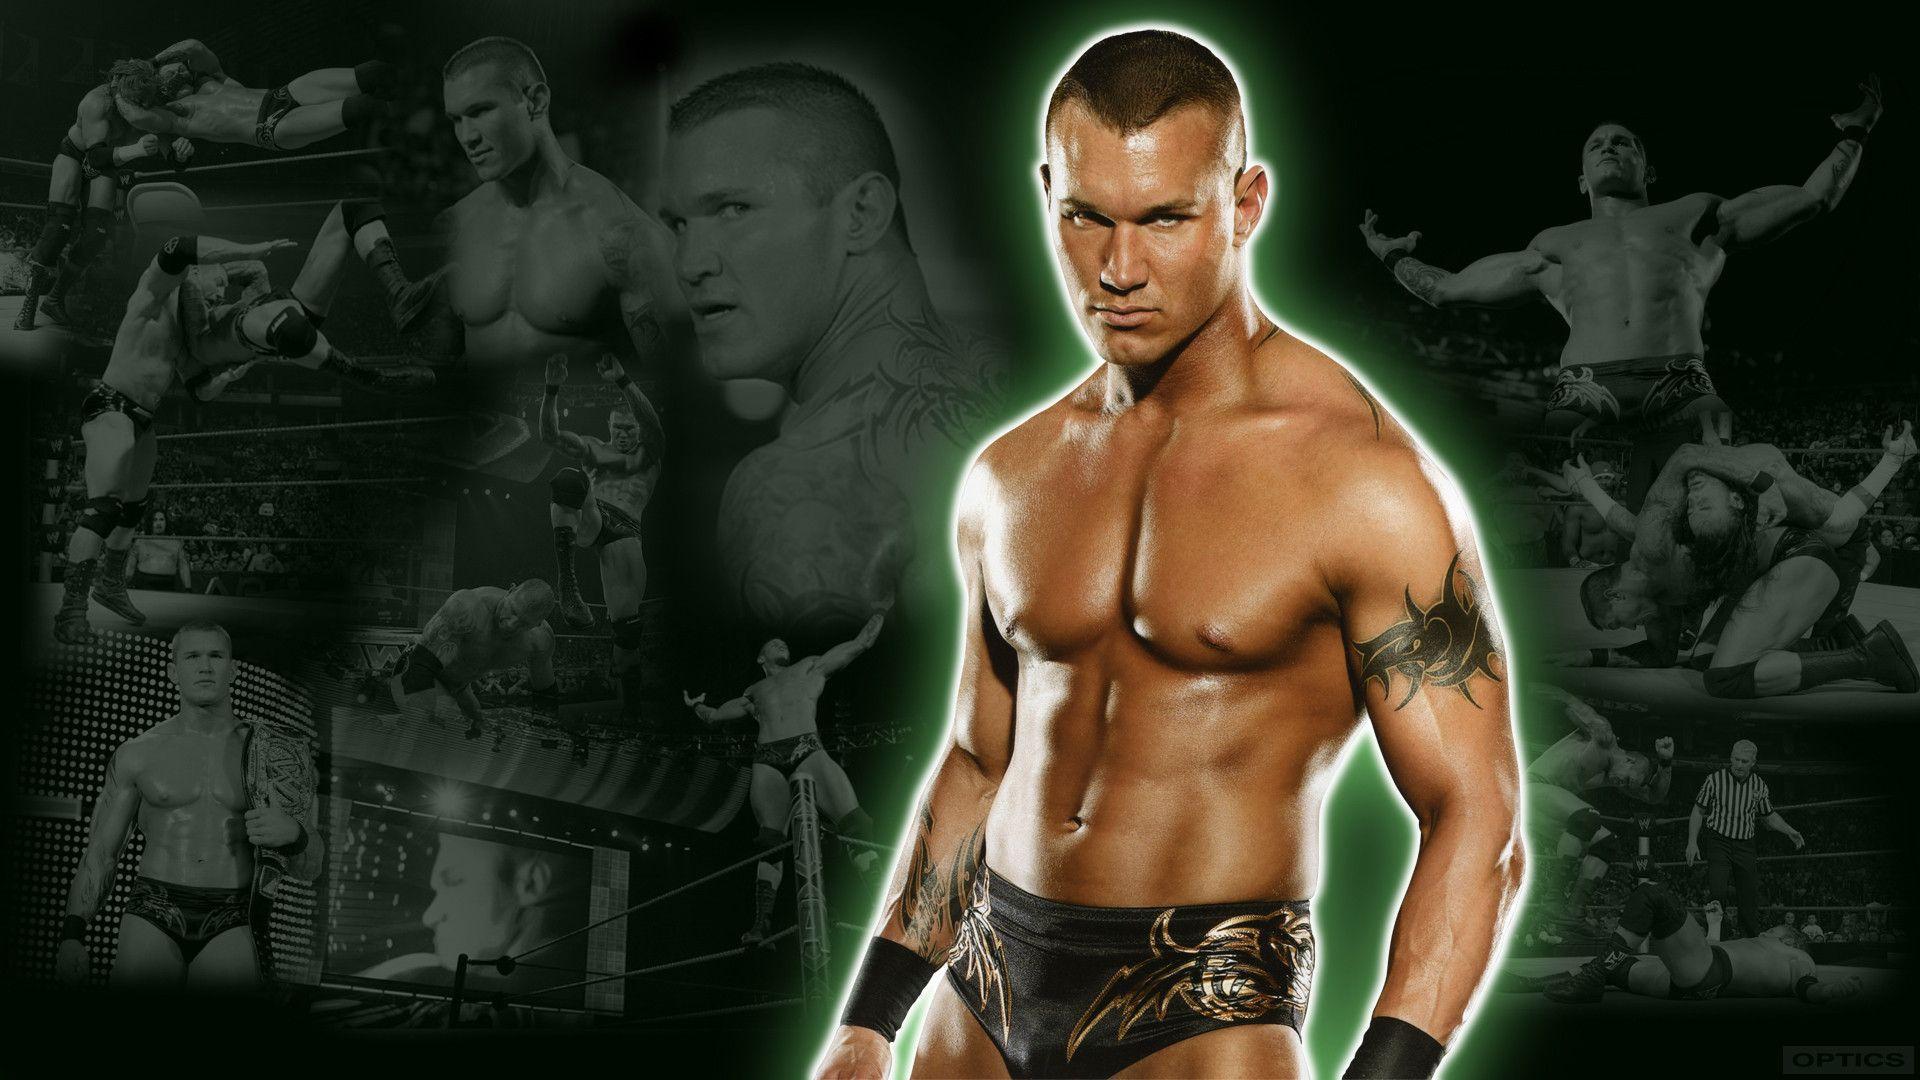 Randy Orton Images